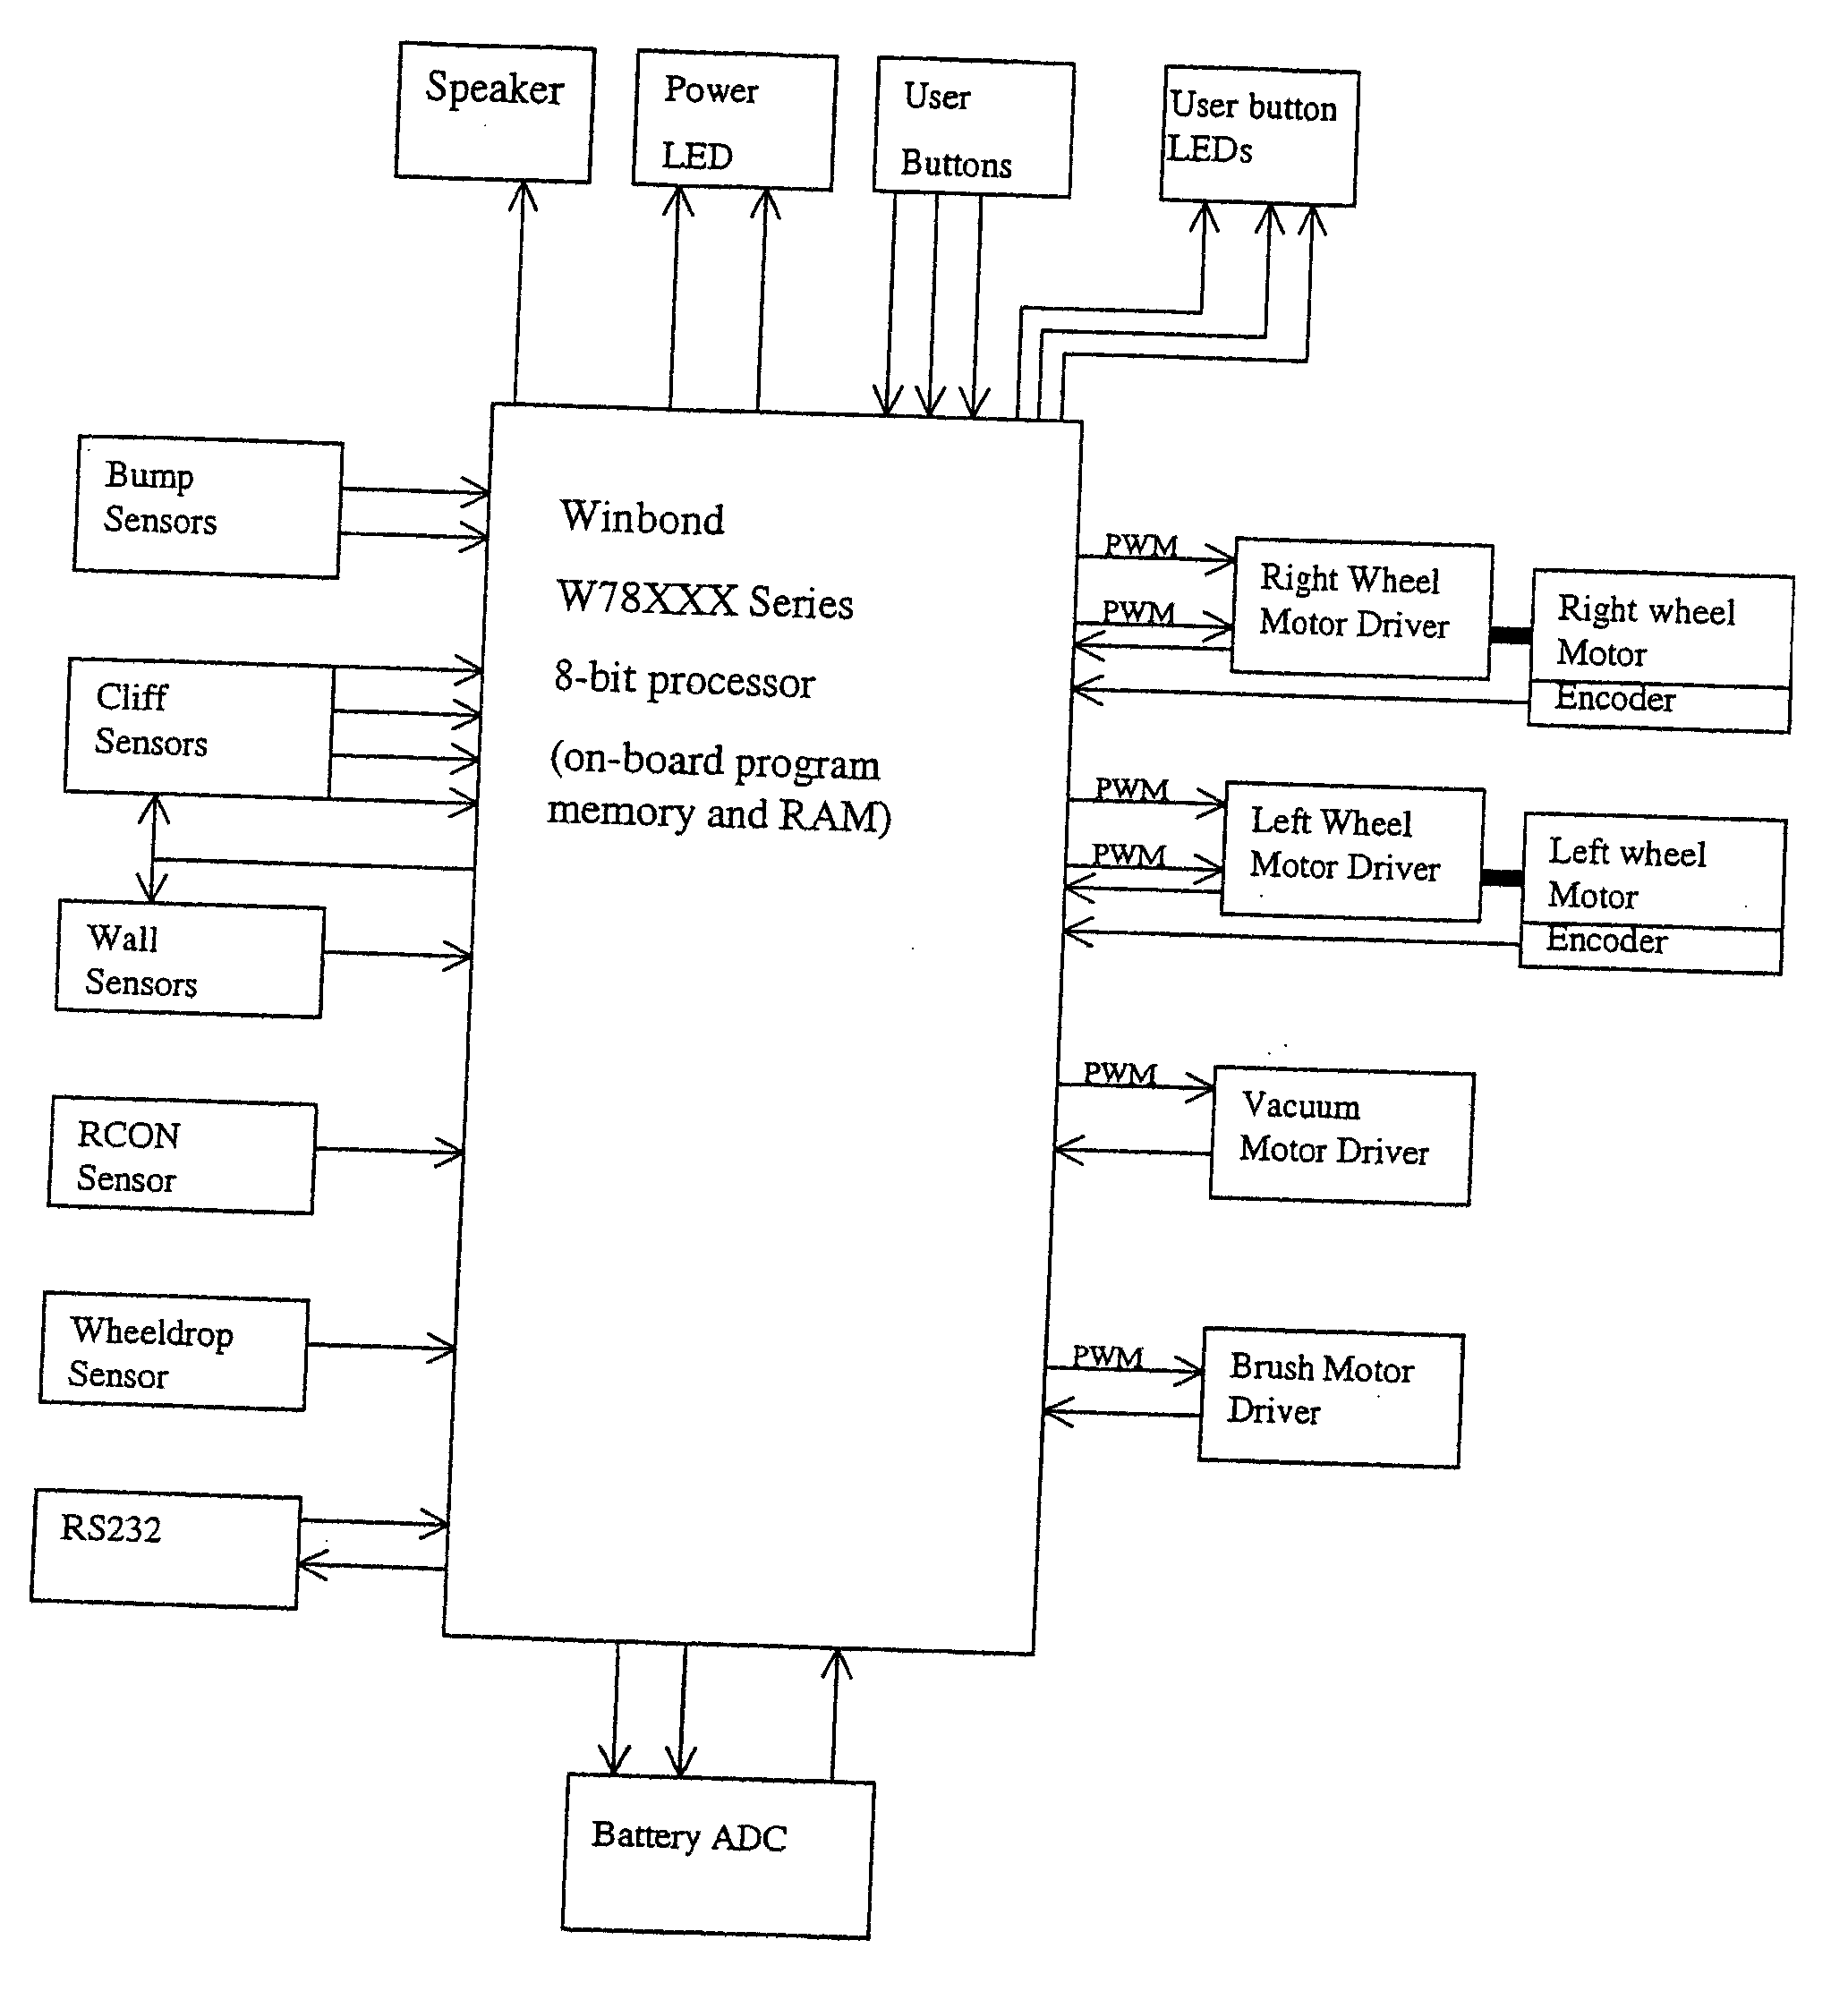 For Led Likewise Smoke Detector Circuit Besides Optical Smoke Detector